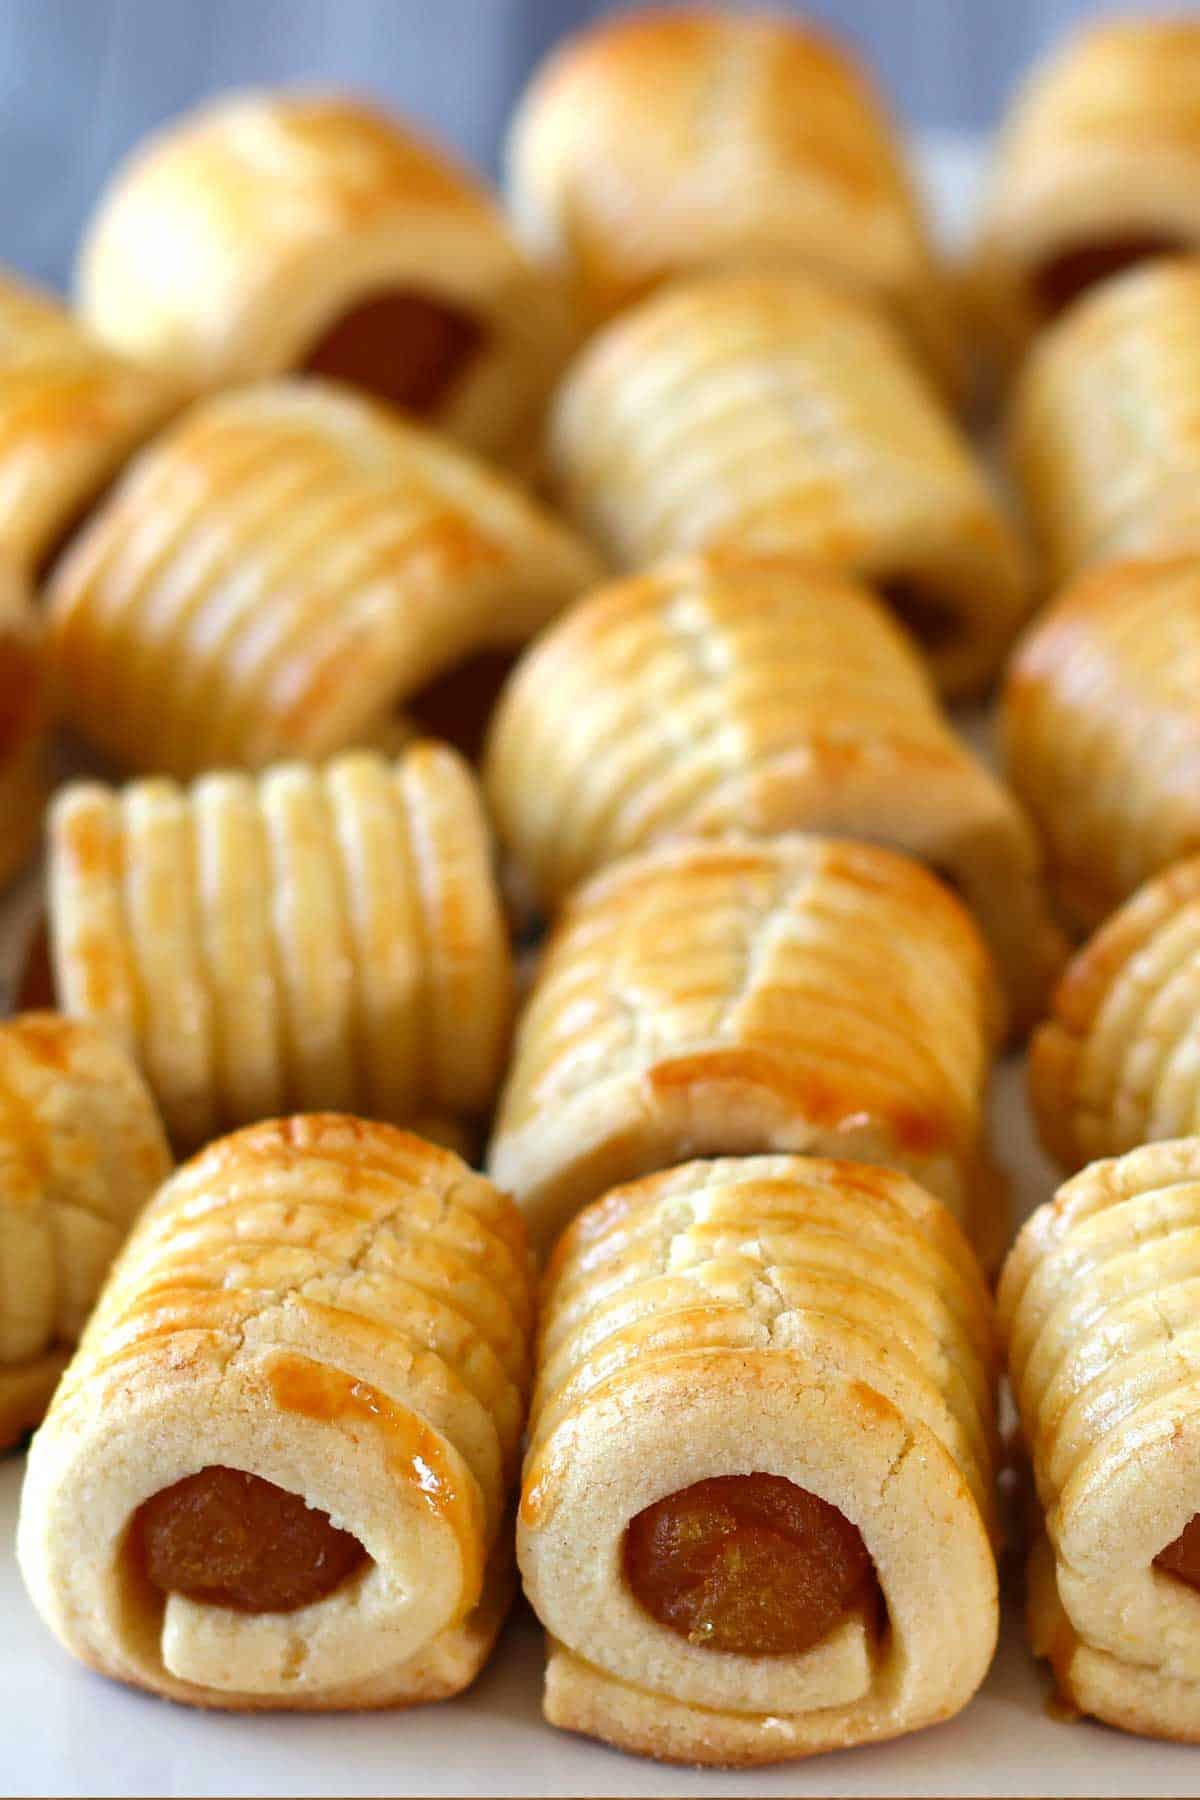 Pineapple tart cookies